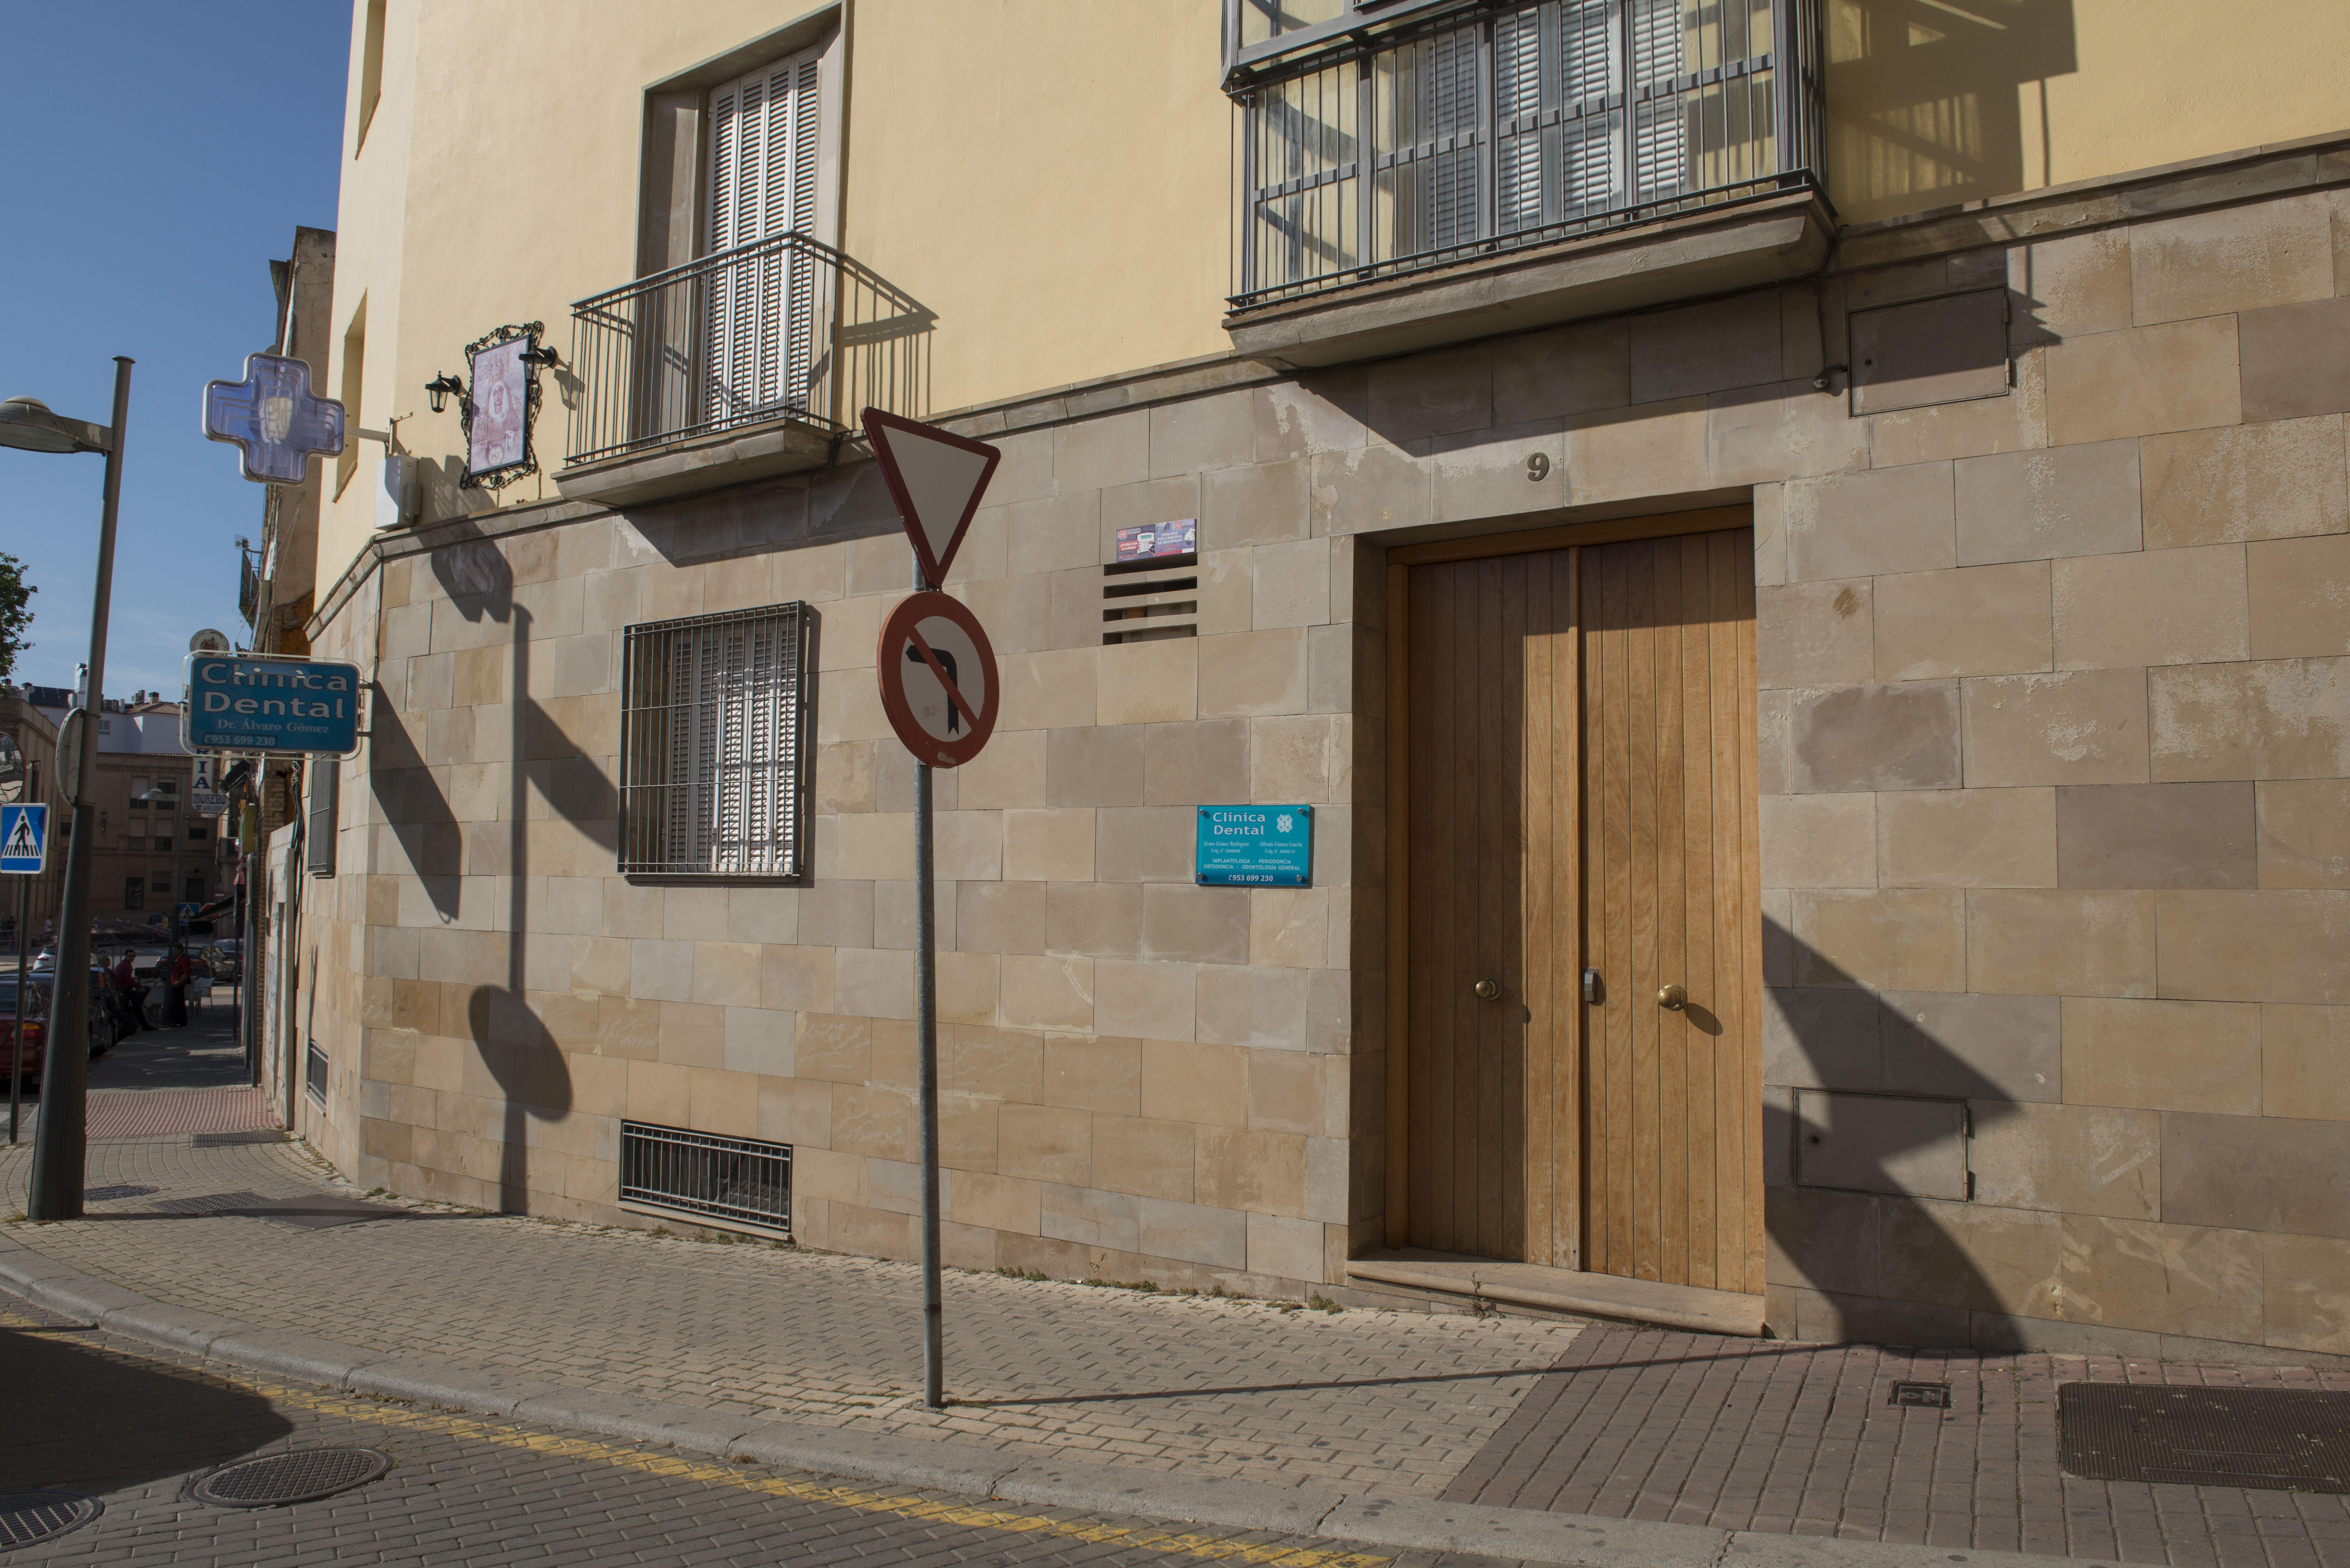 Clínica dental recomendable en Linares